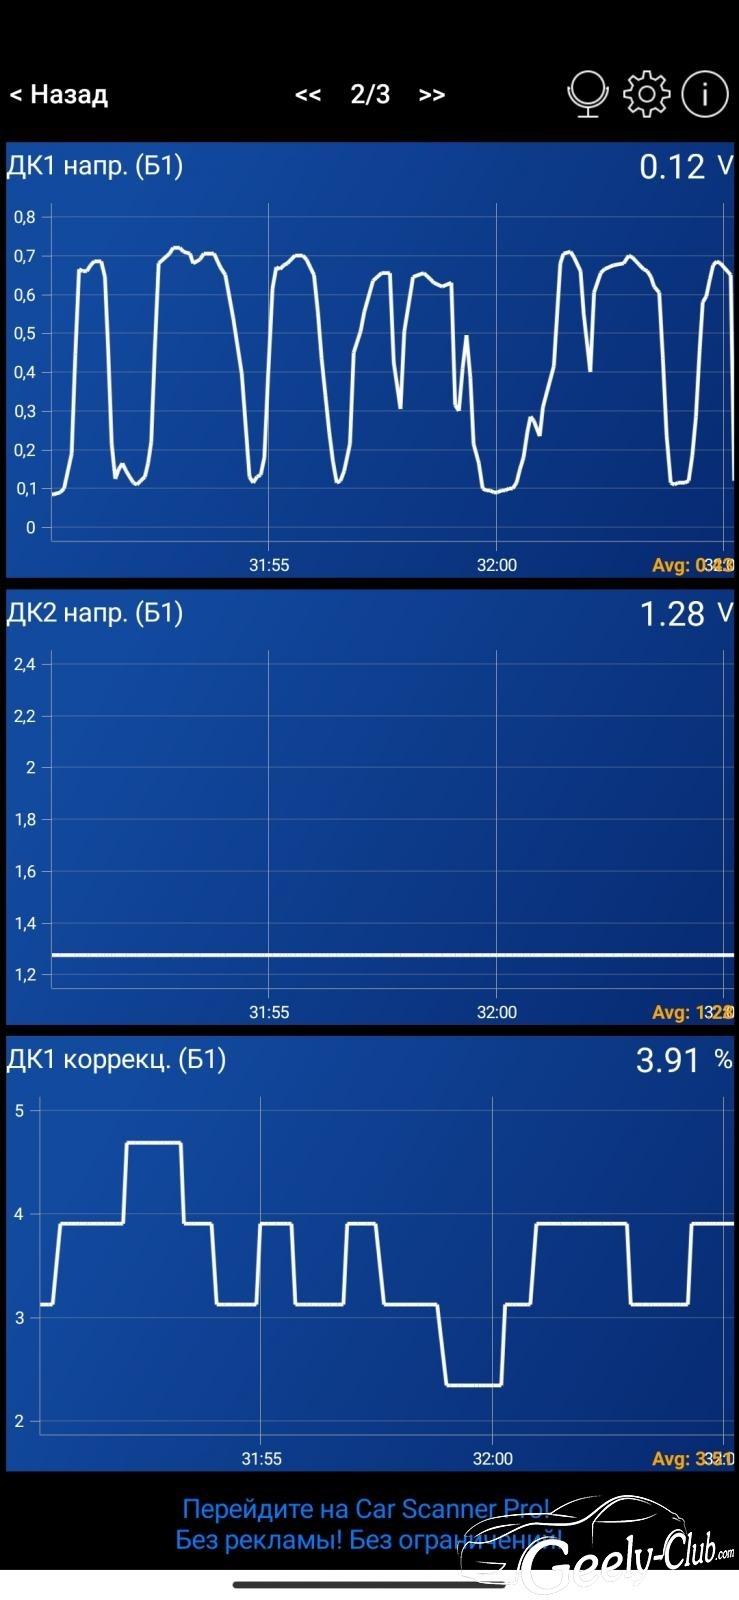 Screenshot_2020-10-11-20-54-58-912_com.ovz.carscanner.jpg